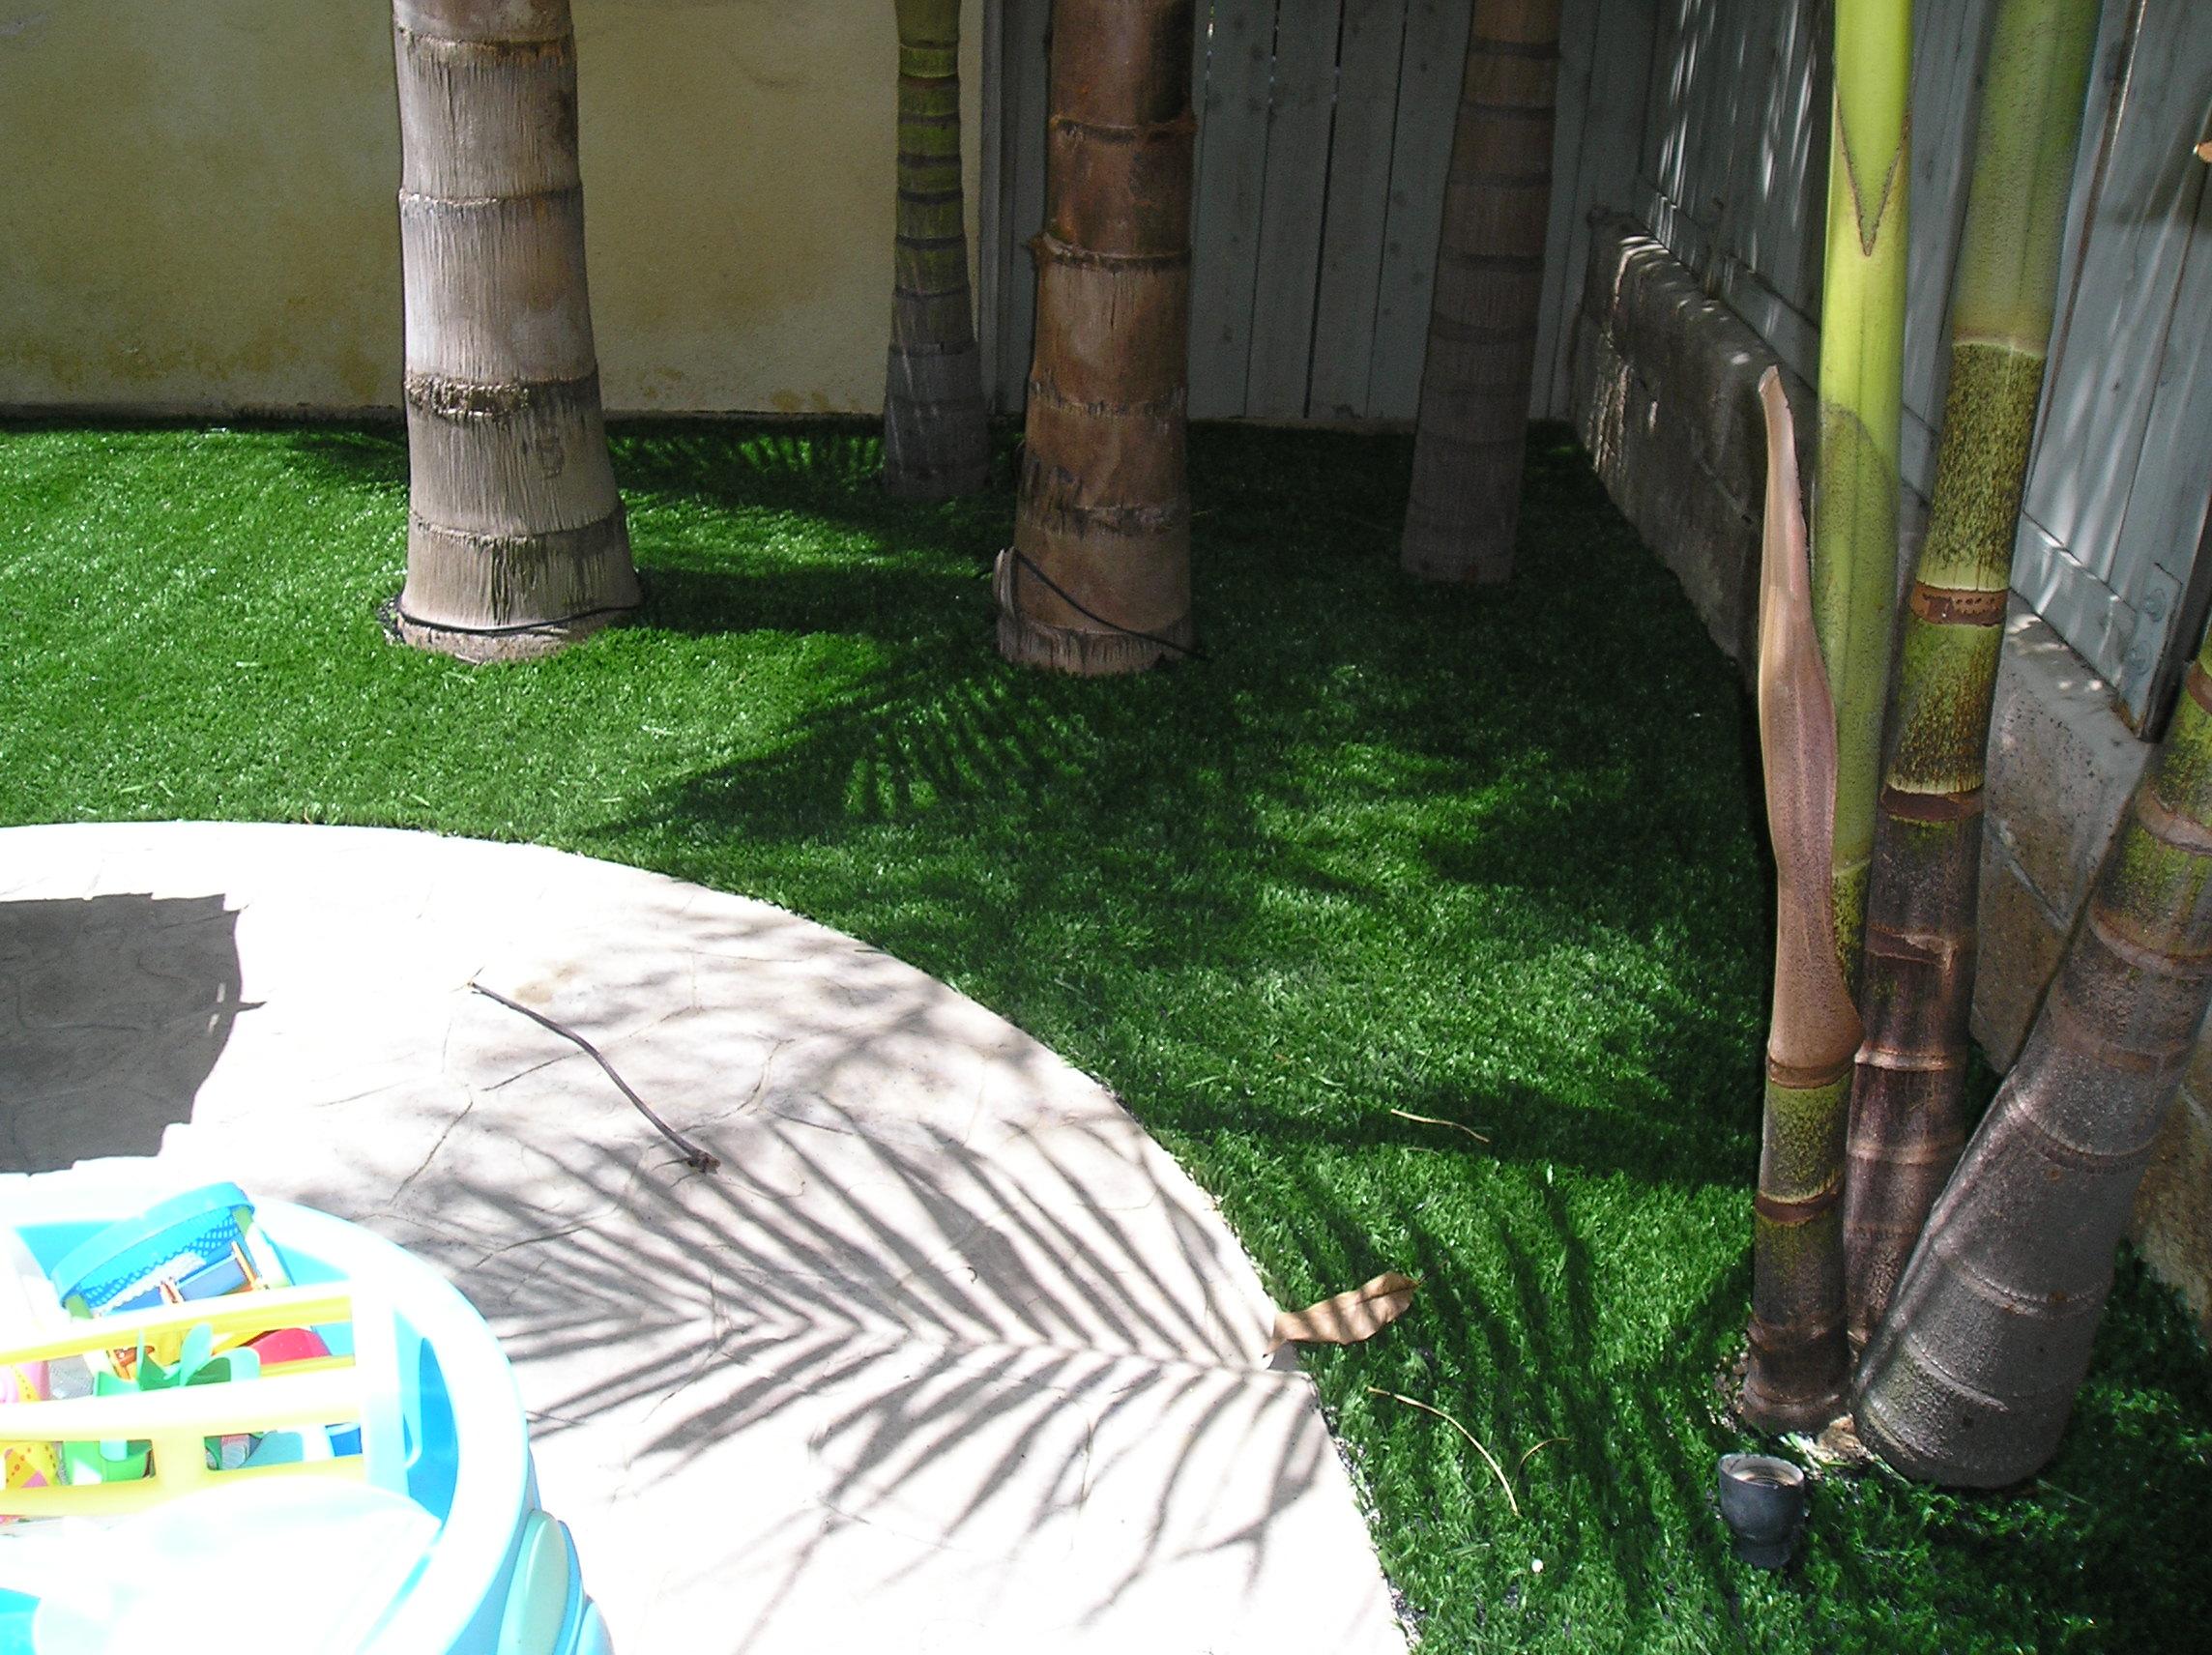 Premium M Blade-80 fake grass for yard,backyard turf,turf backyard,turf yard,fake grass for backyard,artificial turf,synthetic turf,artificial turf installation,how to install artificial turf,used artificial turf,used artificial turf